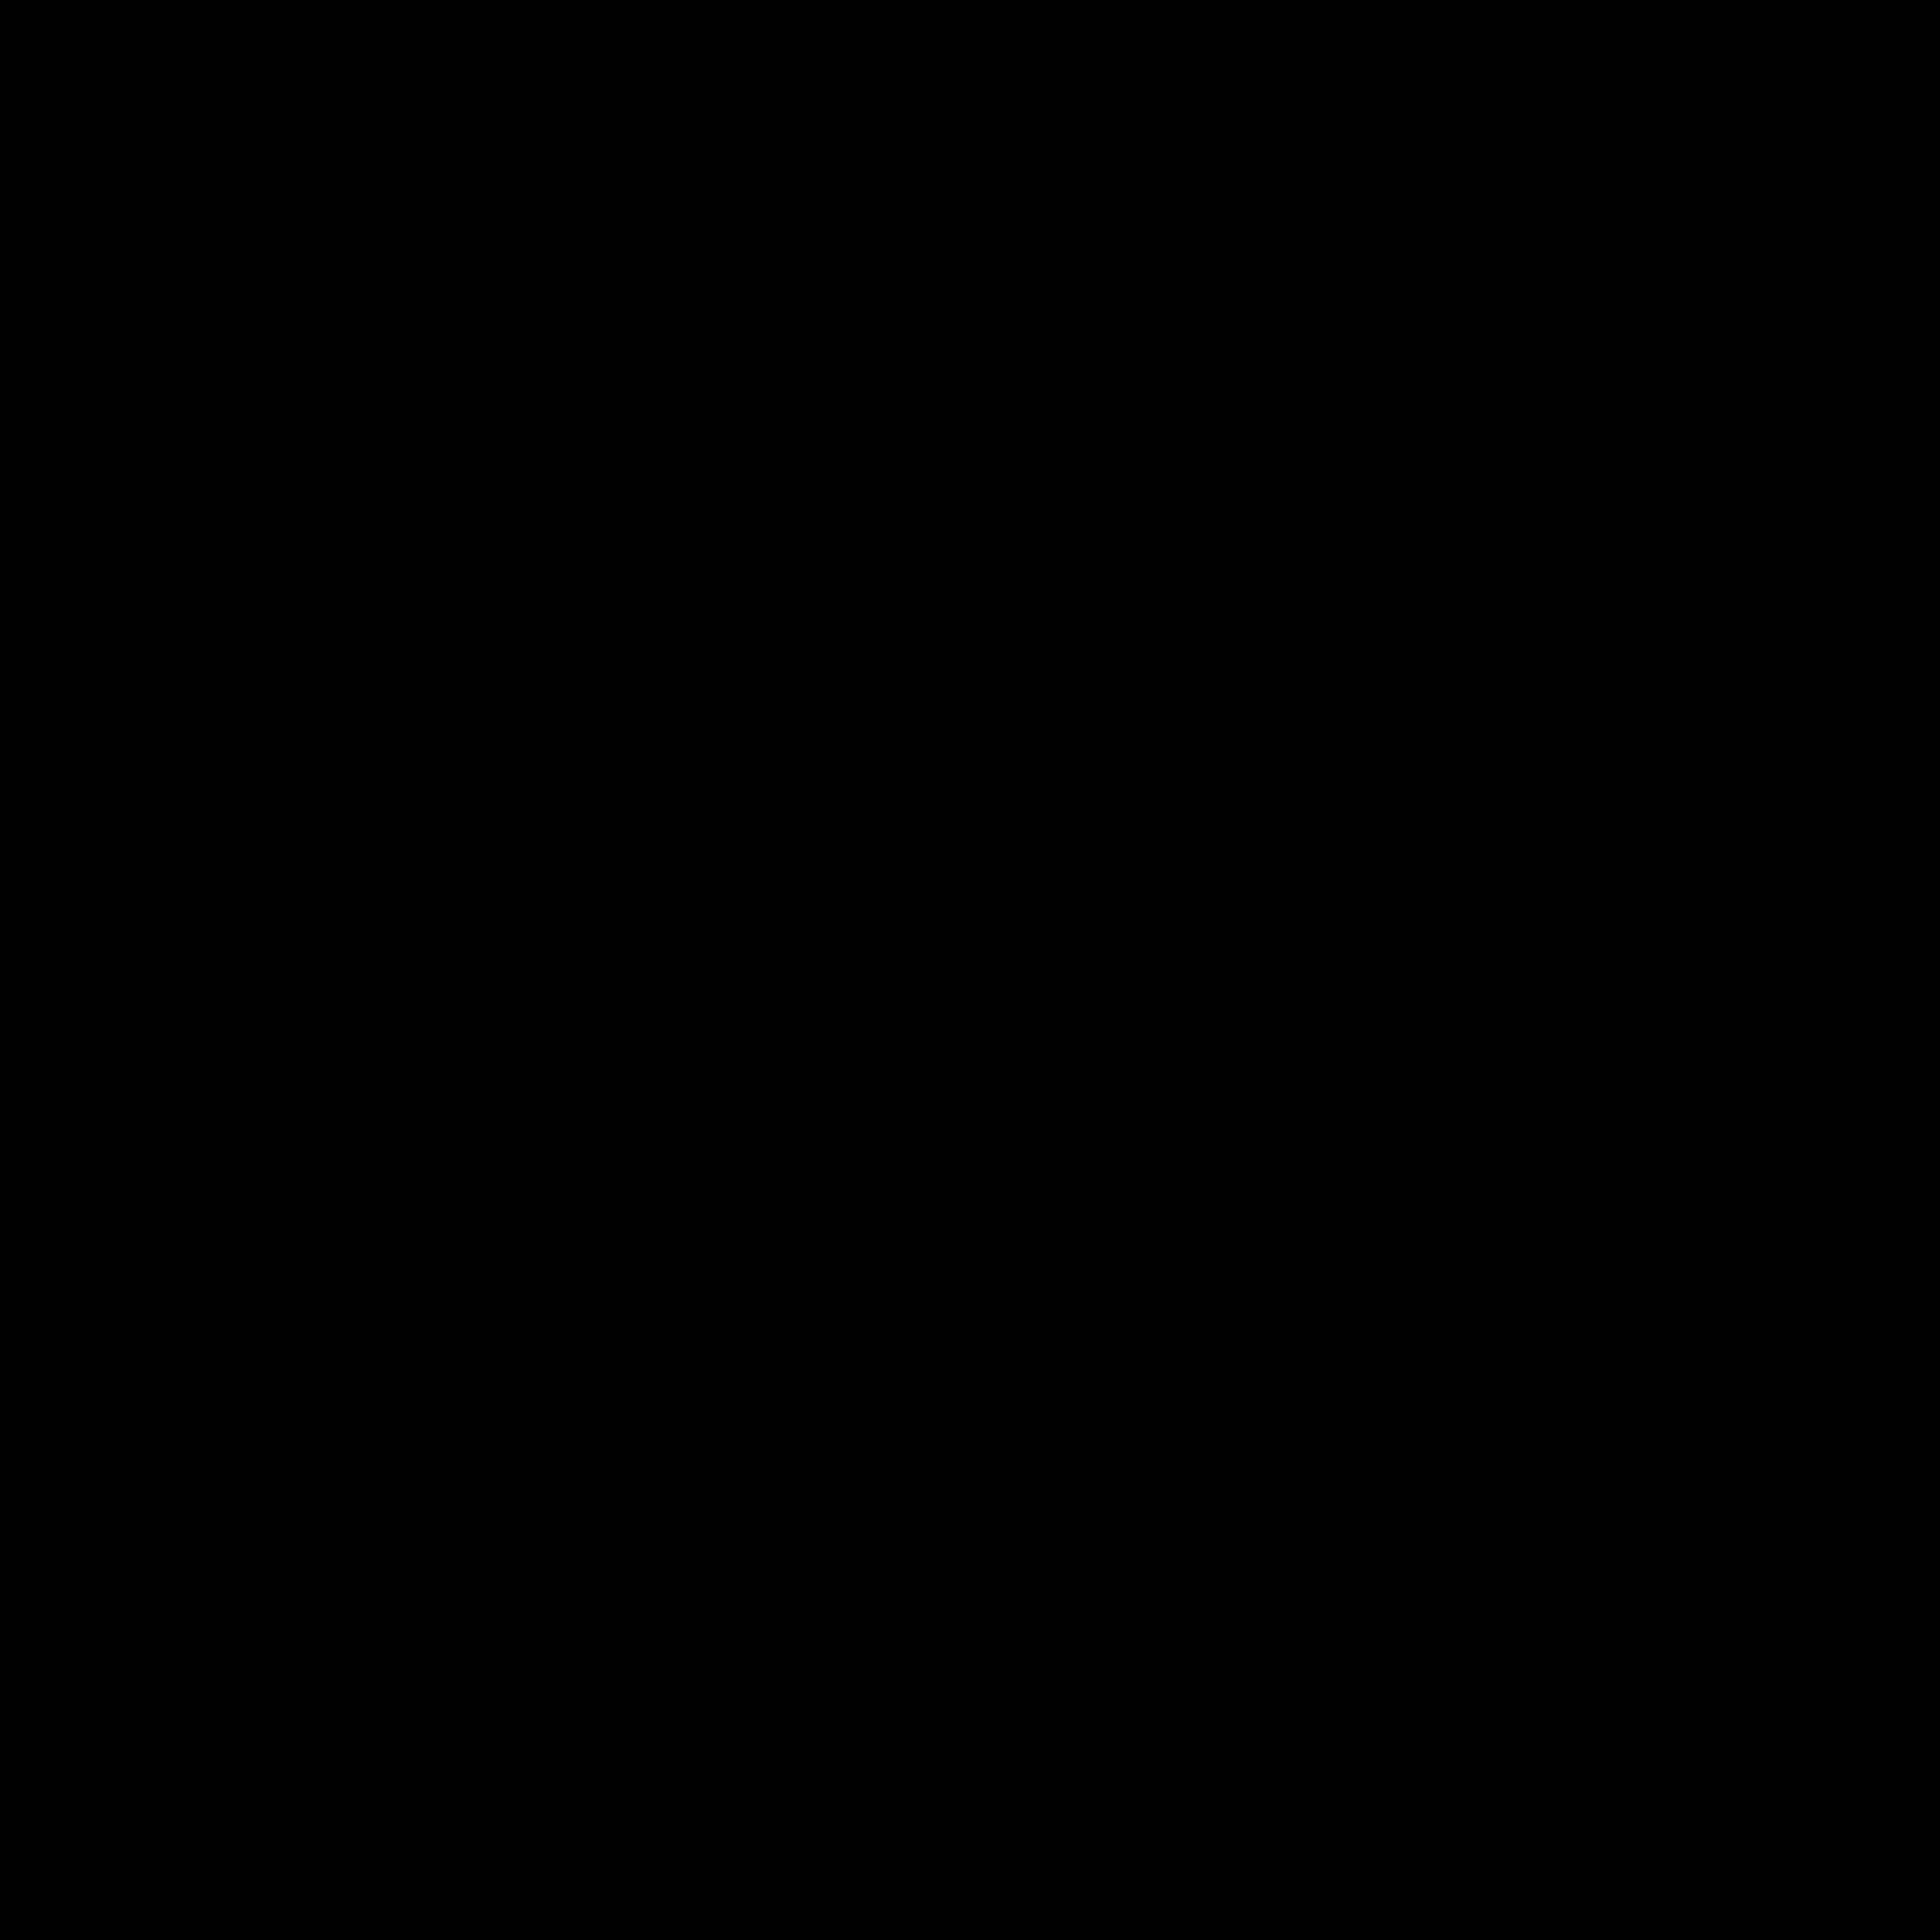 Circle frame damask clipart